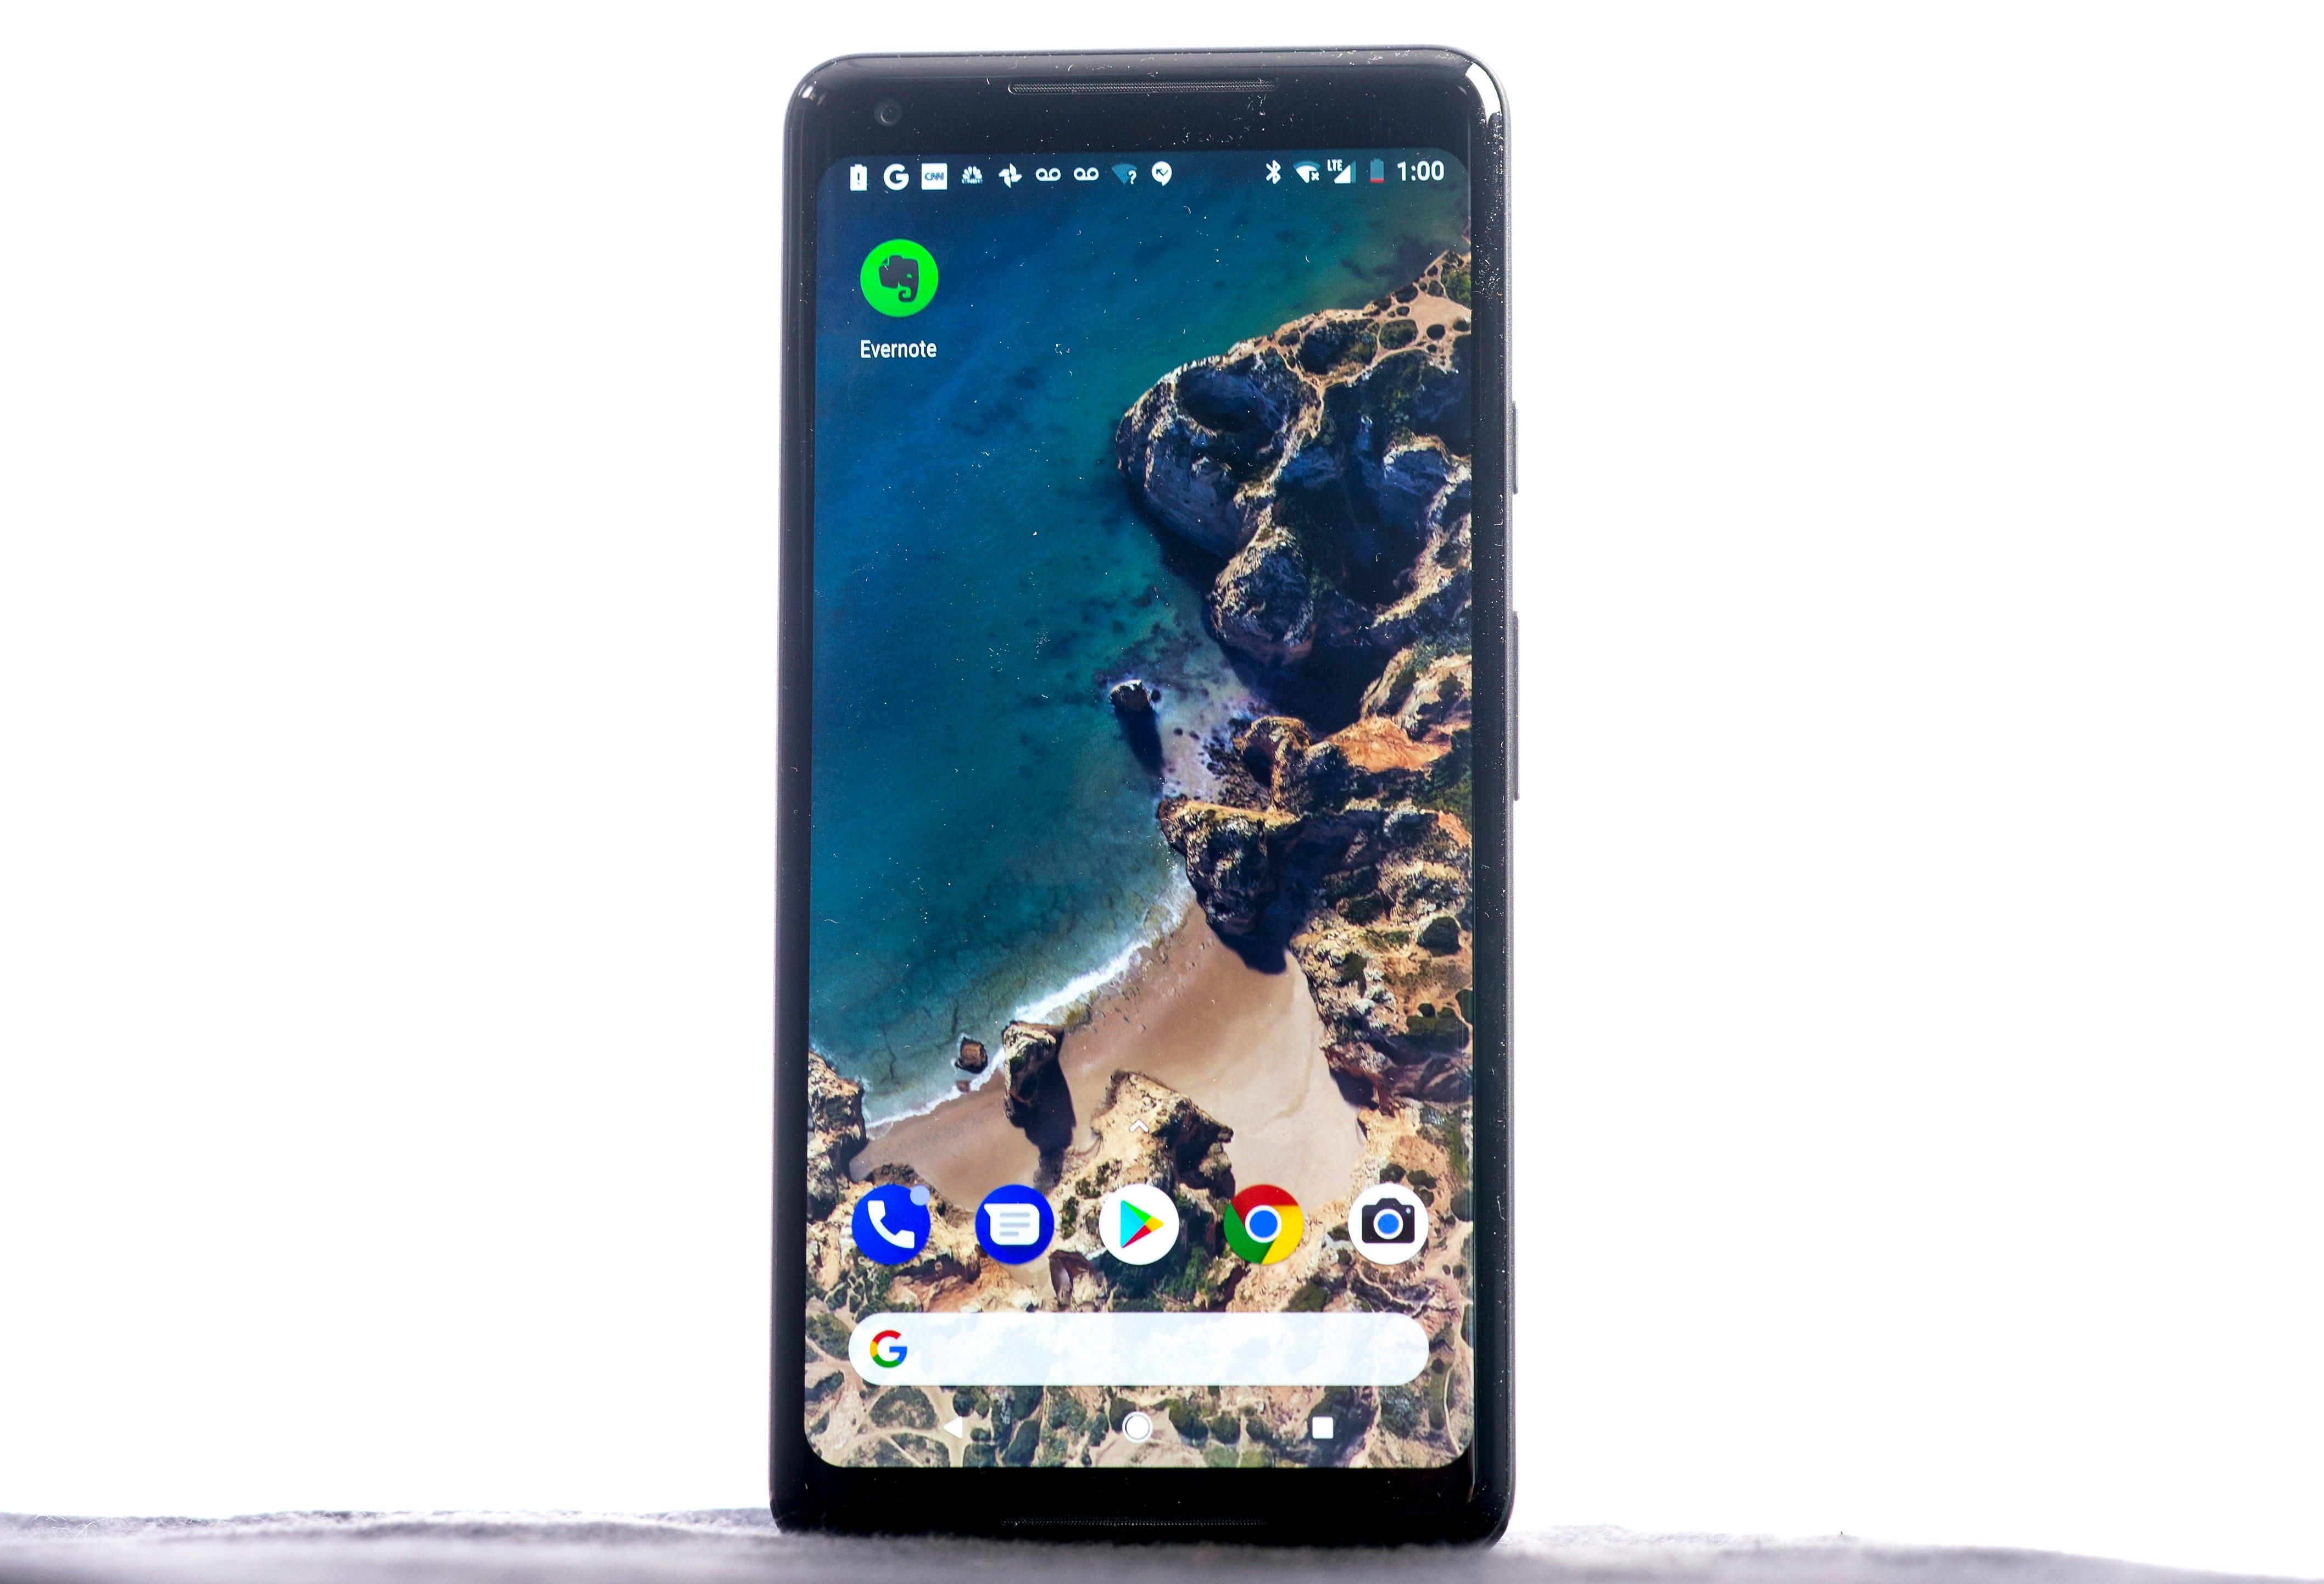 Google Pixel 2 phone challenges iPhone X, Samsung Galaxy